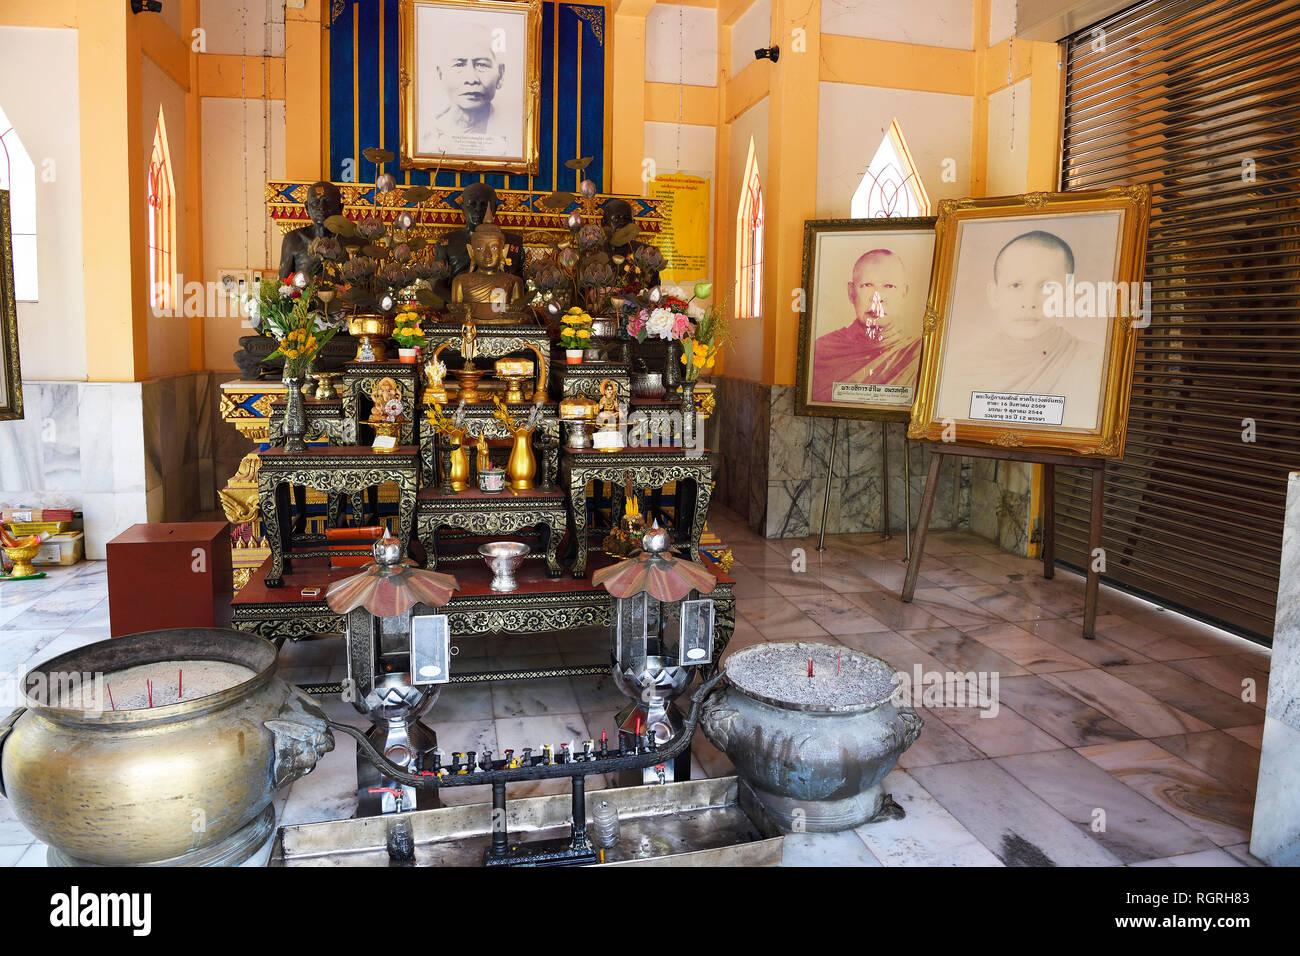 Grabstaette fuer Moenche, Tempel Wat Phra Thong, Phuket, Thailand - Stock Image